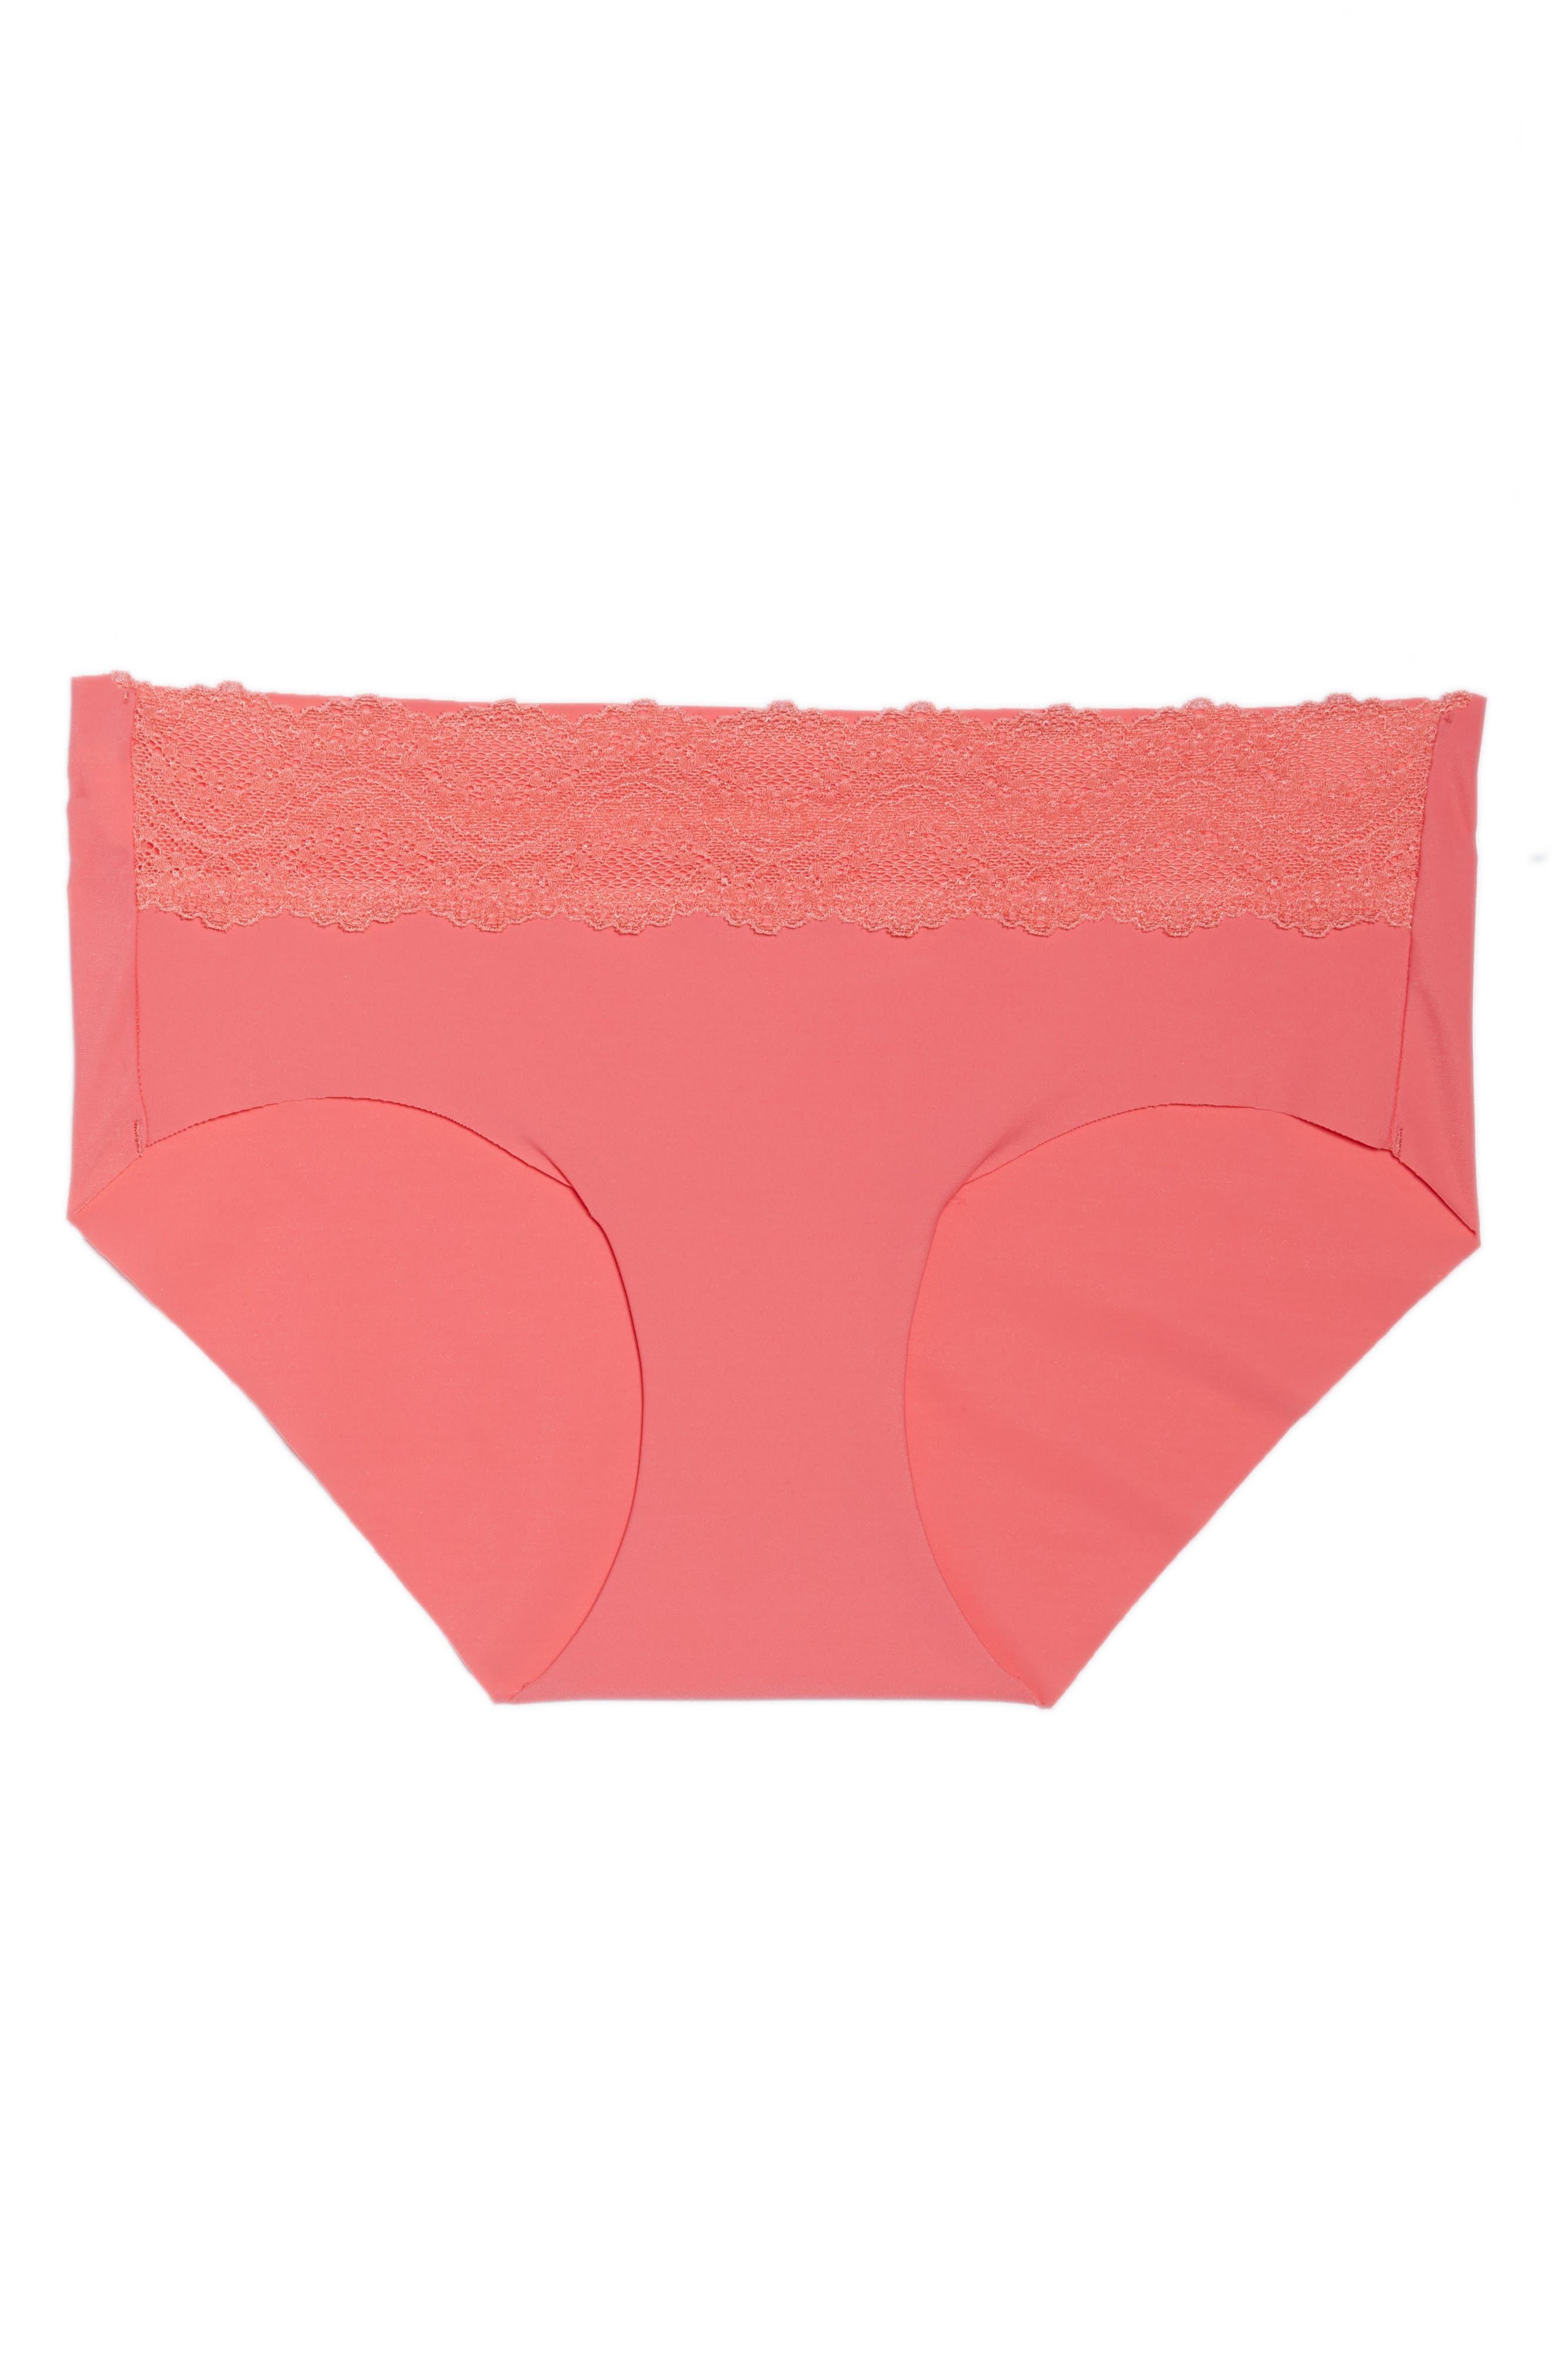 b.bare Hipster Panties,                             Alternate thumbnail 4, color,                             Calypso Coral